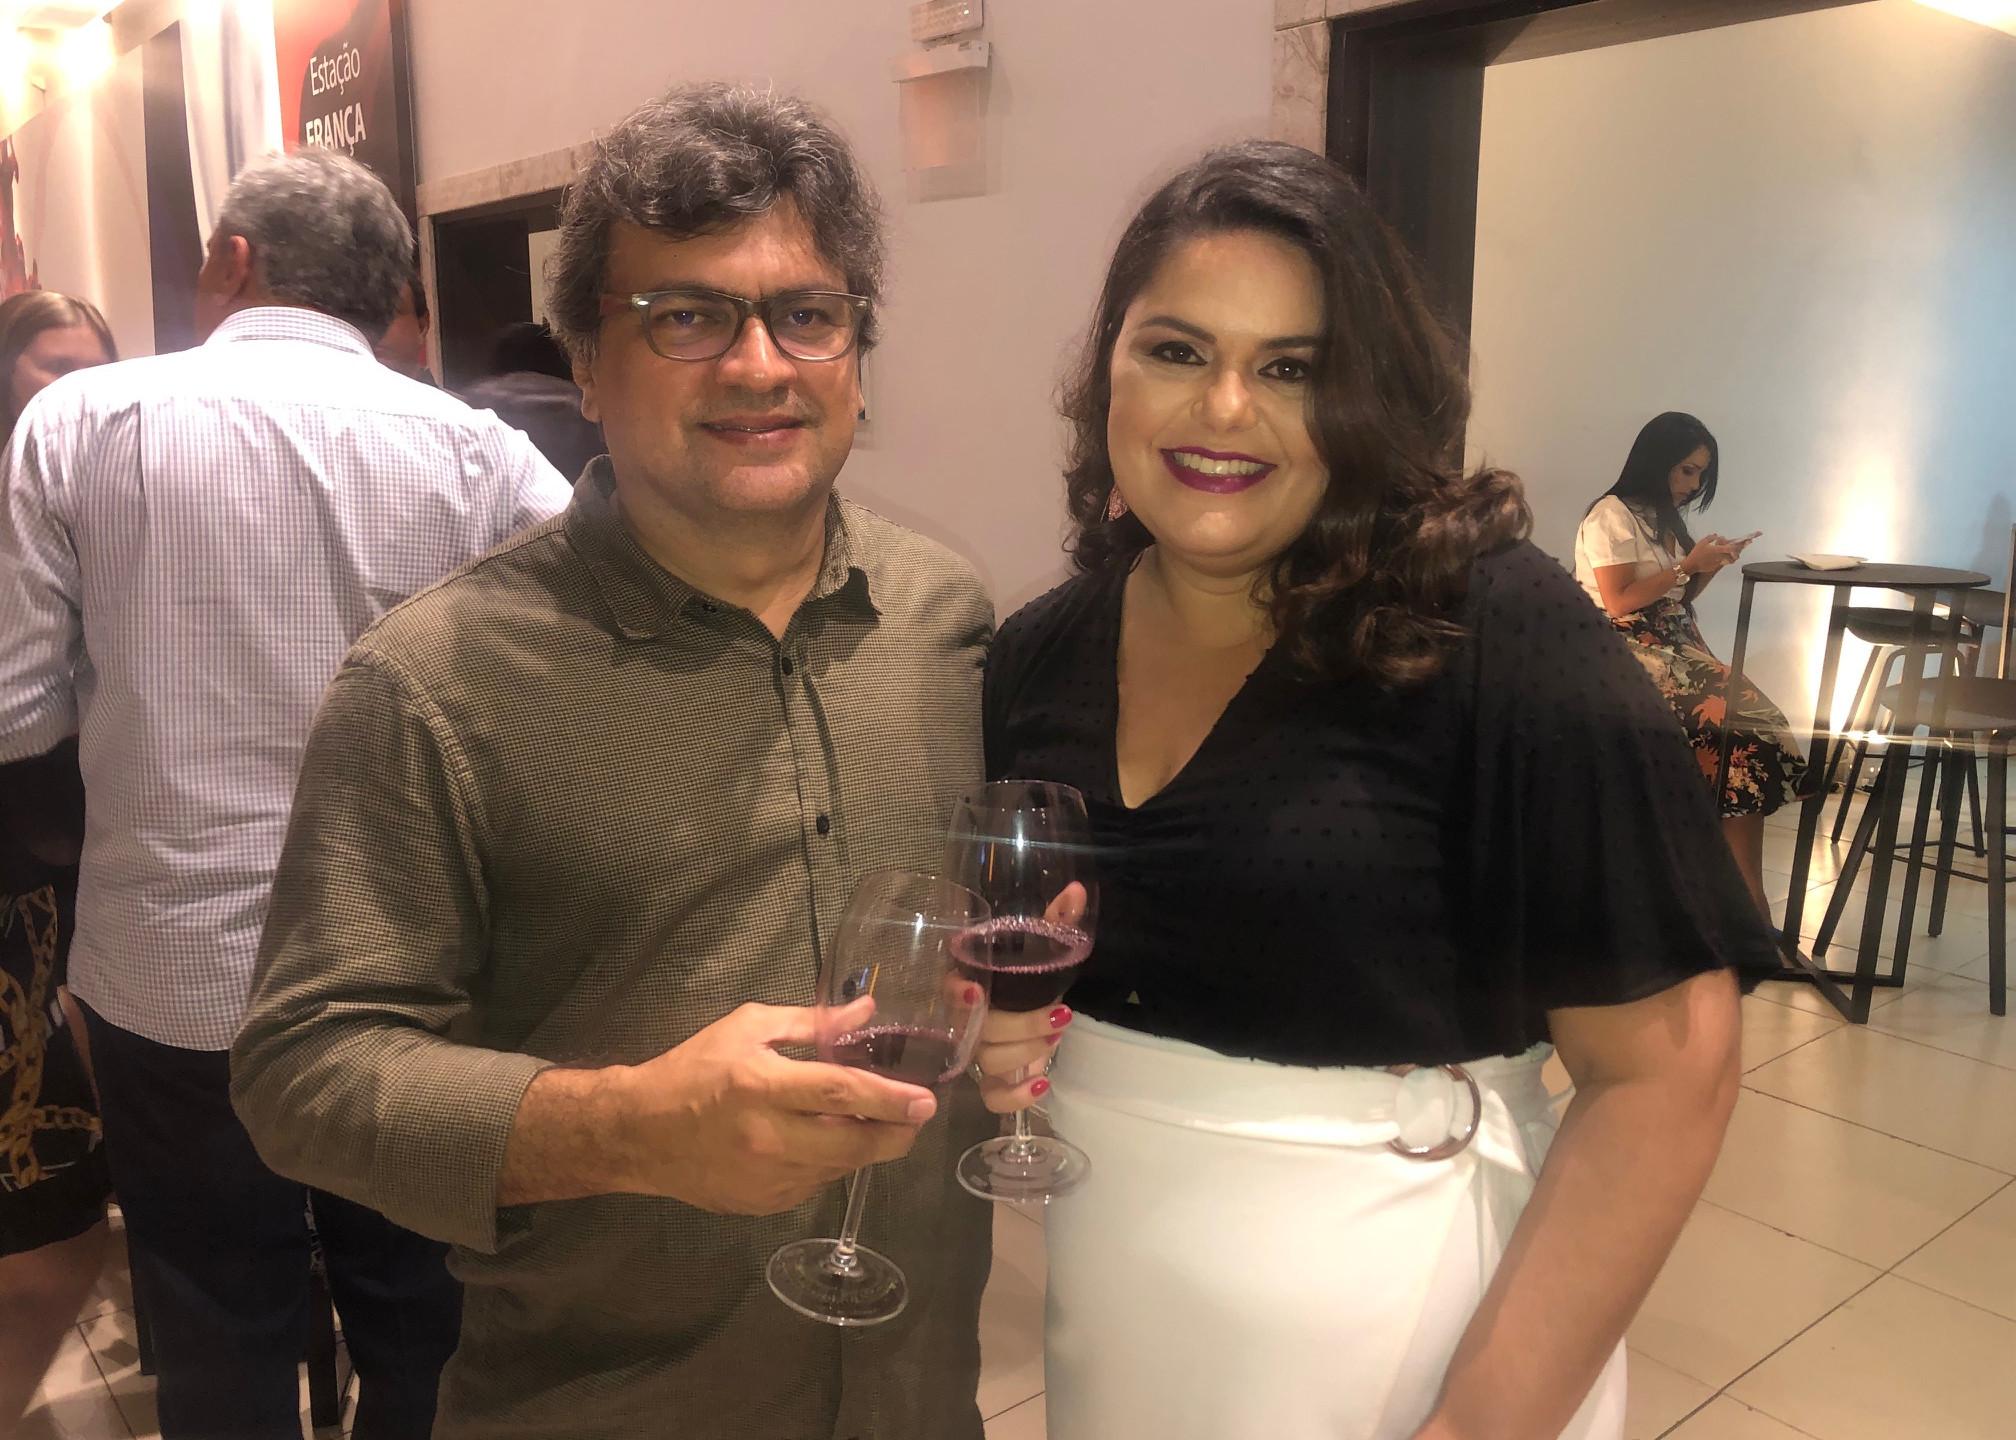 Os jornalistas Itevaldo Jr e Roberta Gomes.